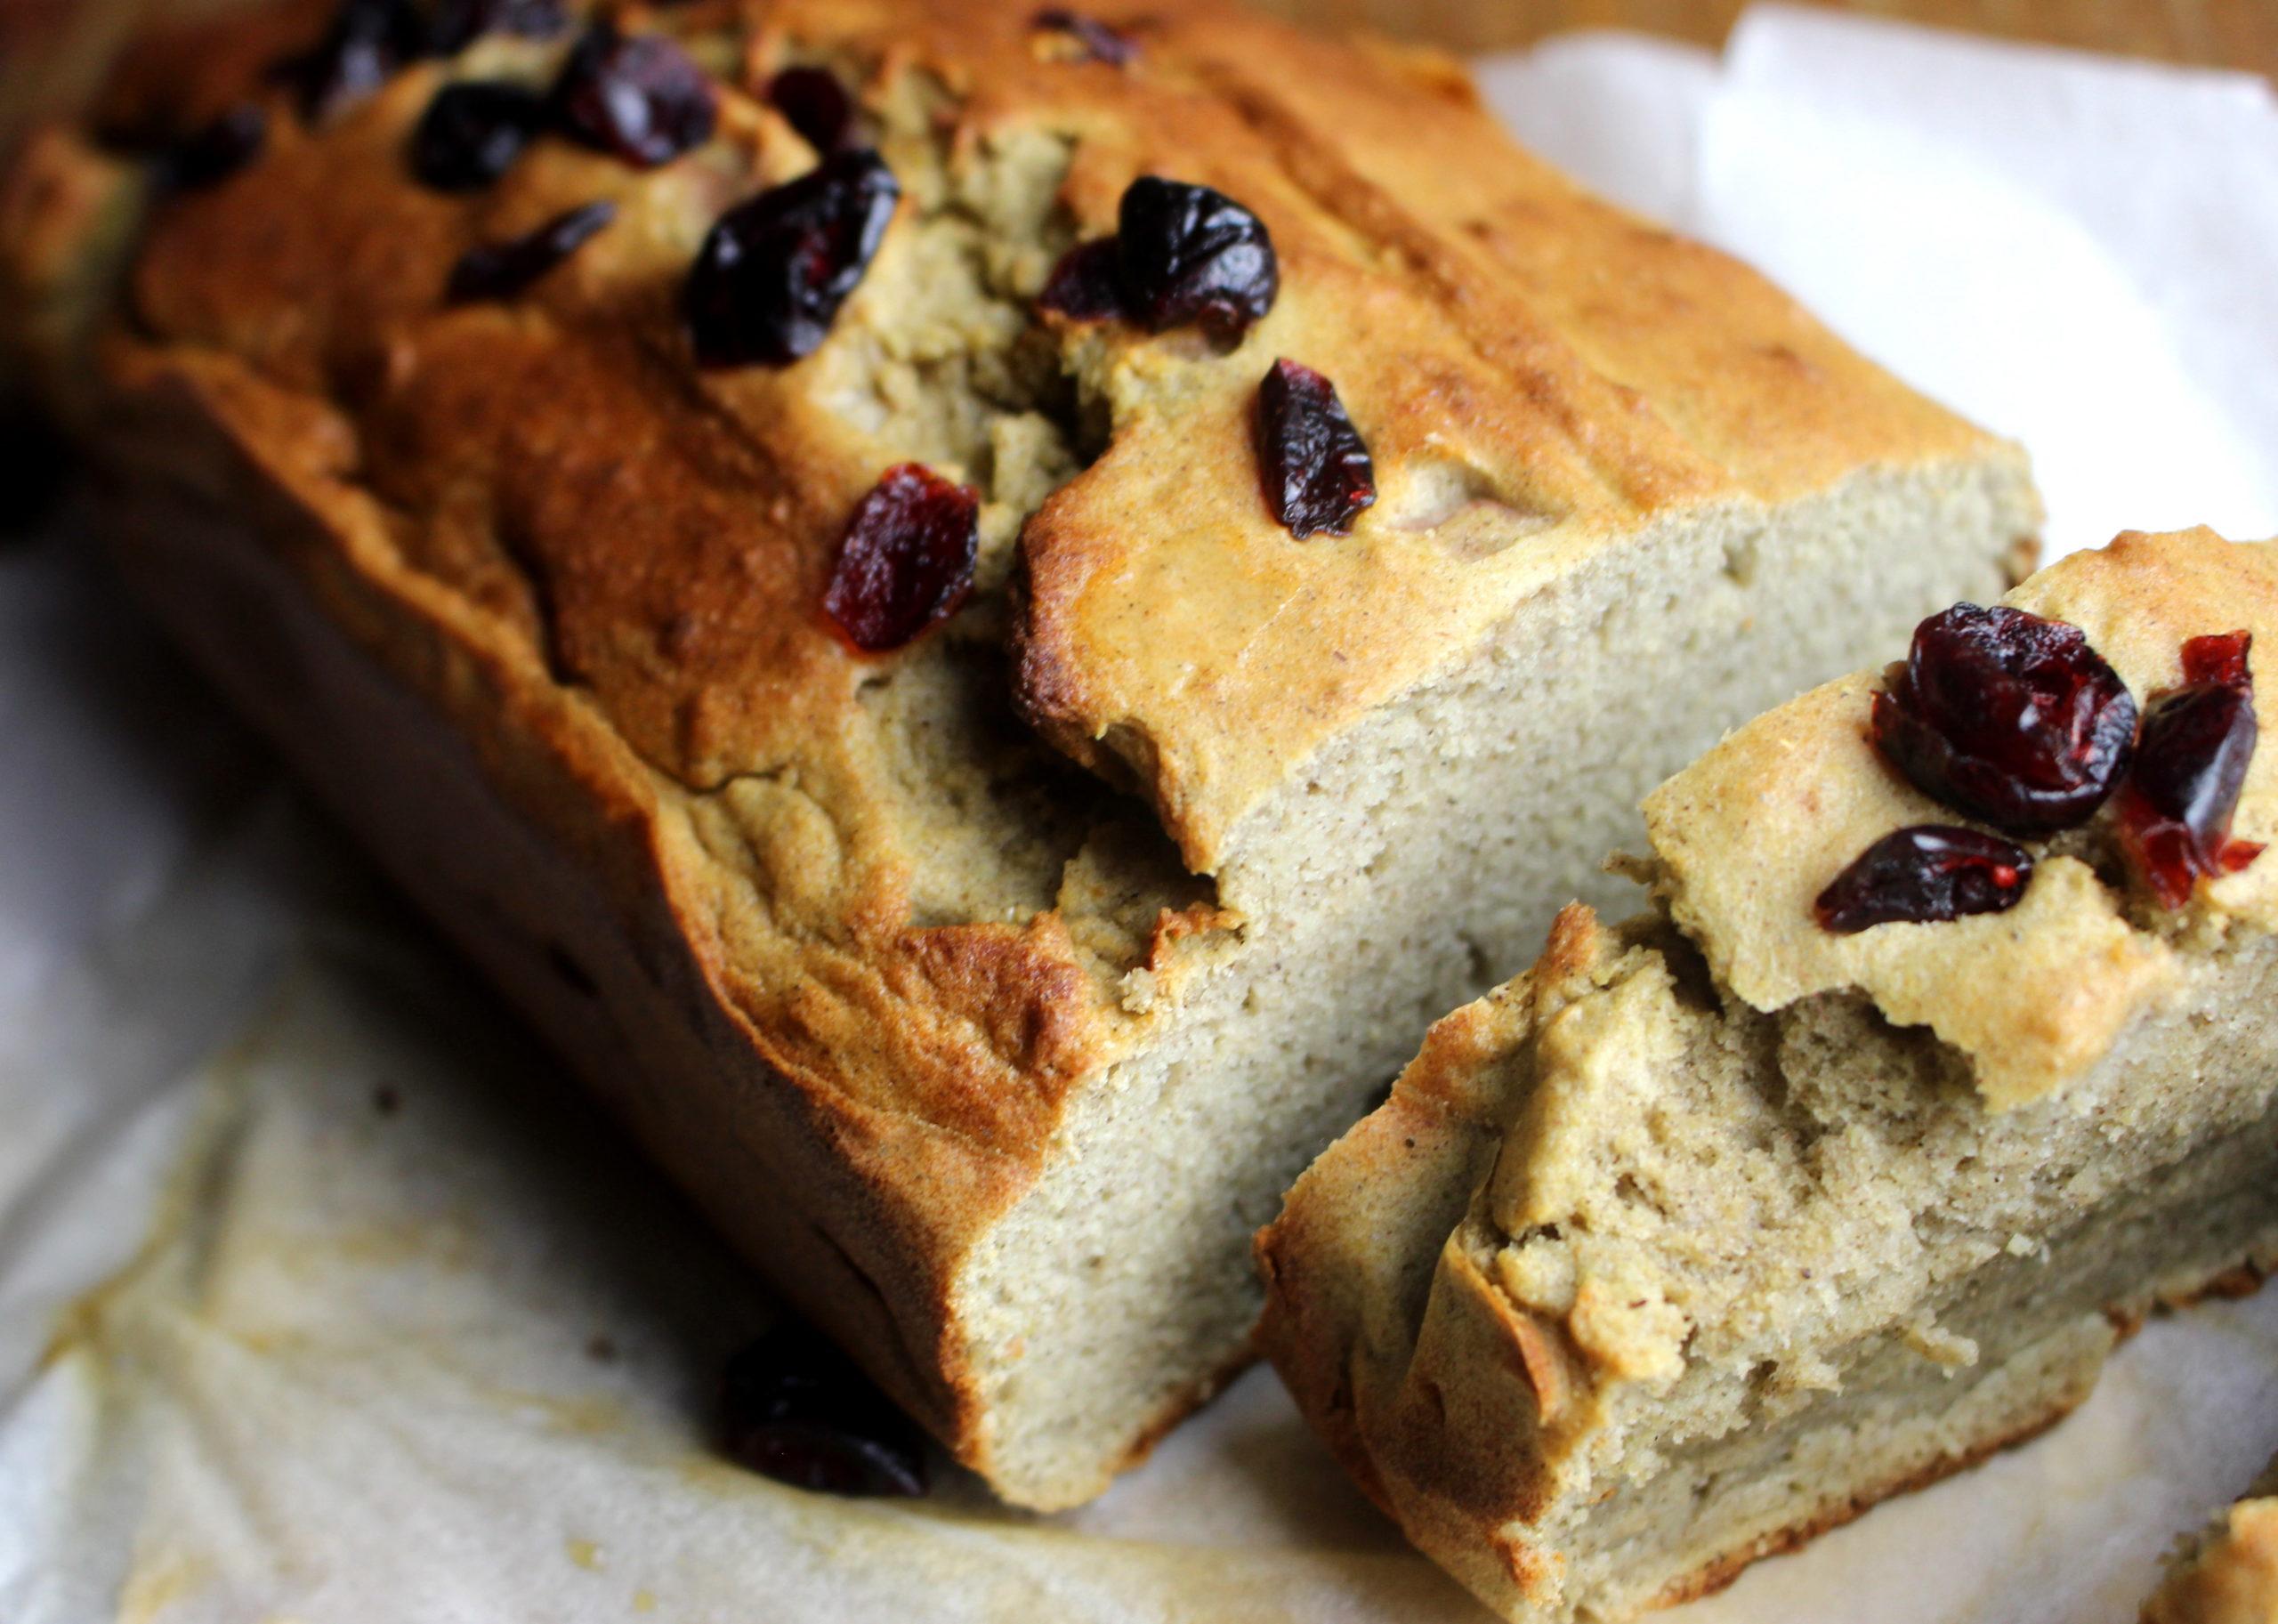 bread cake à la farine de soja clémentine cranberries